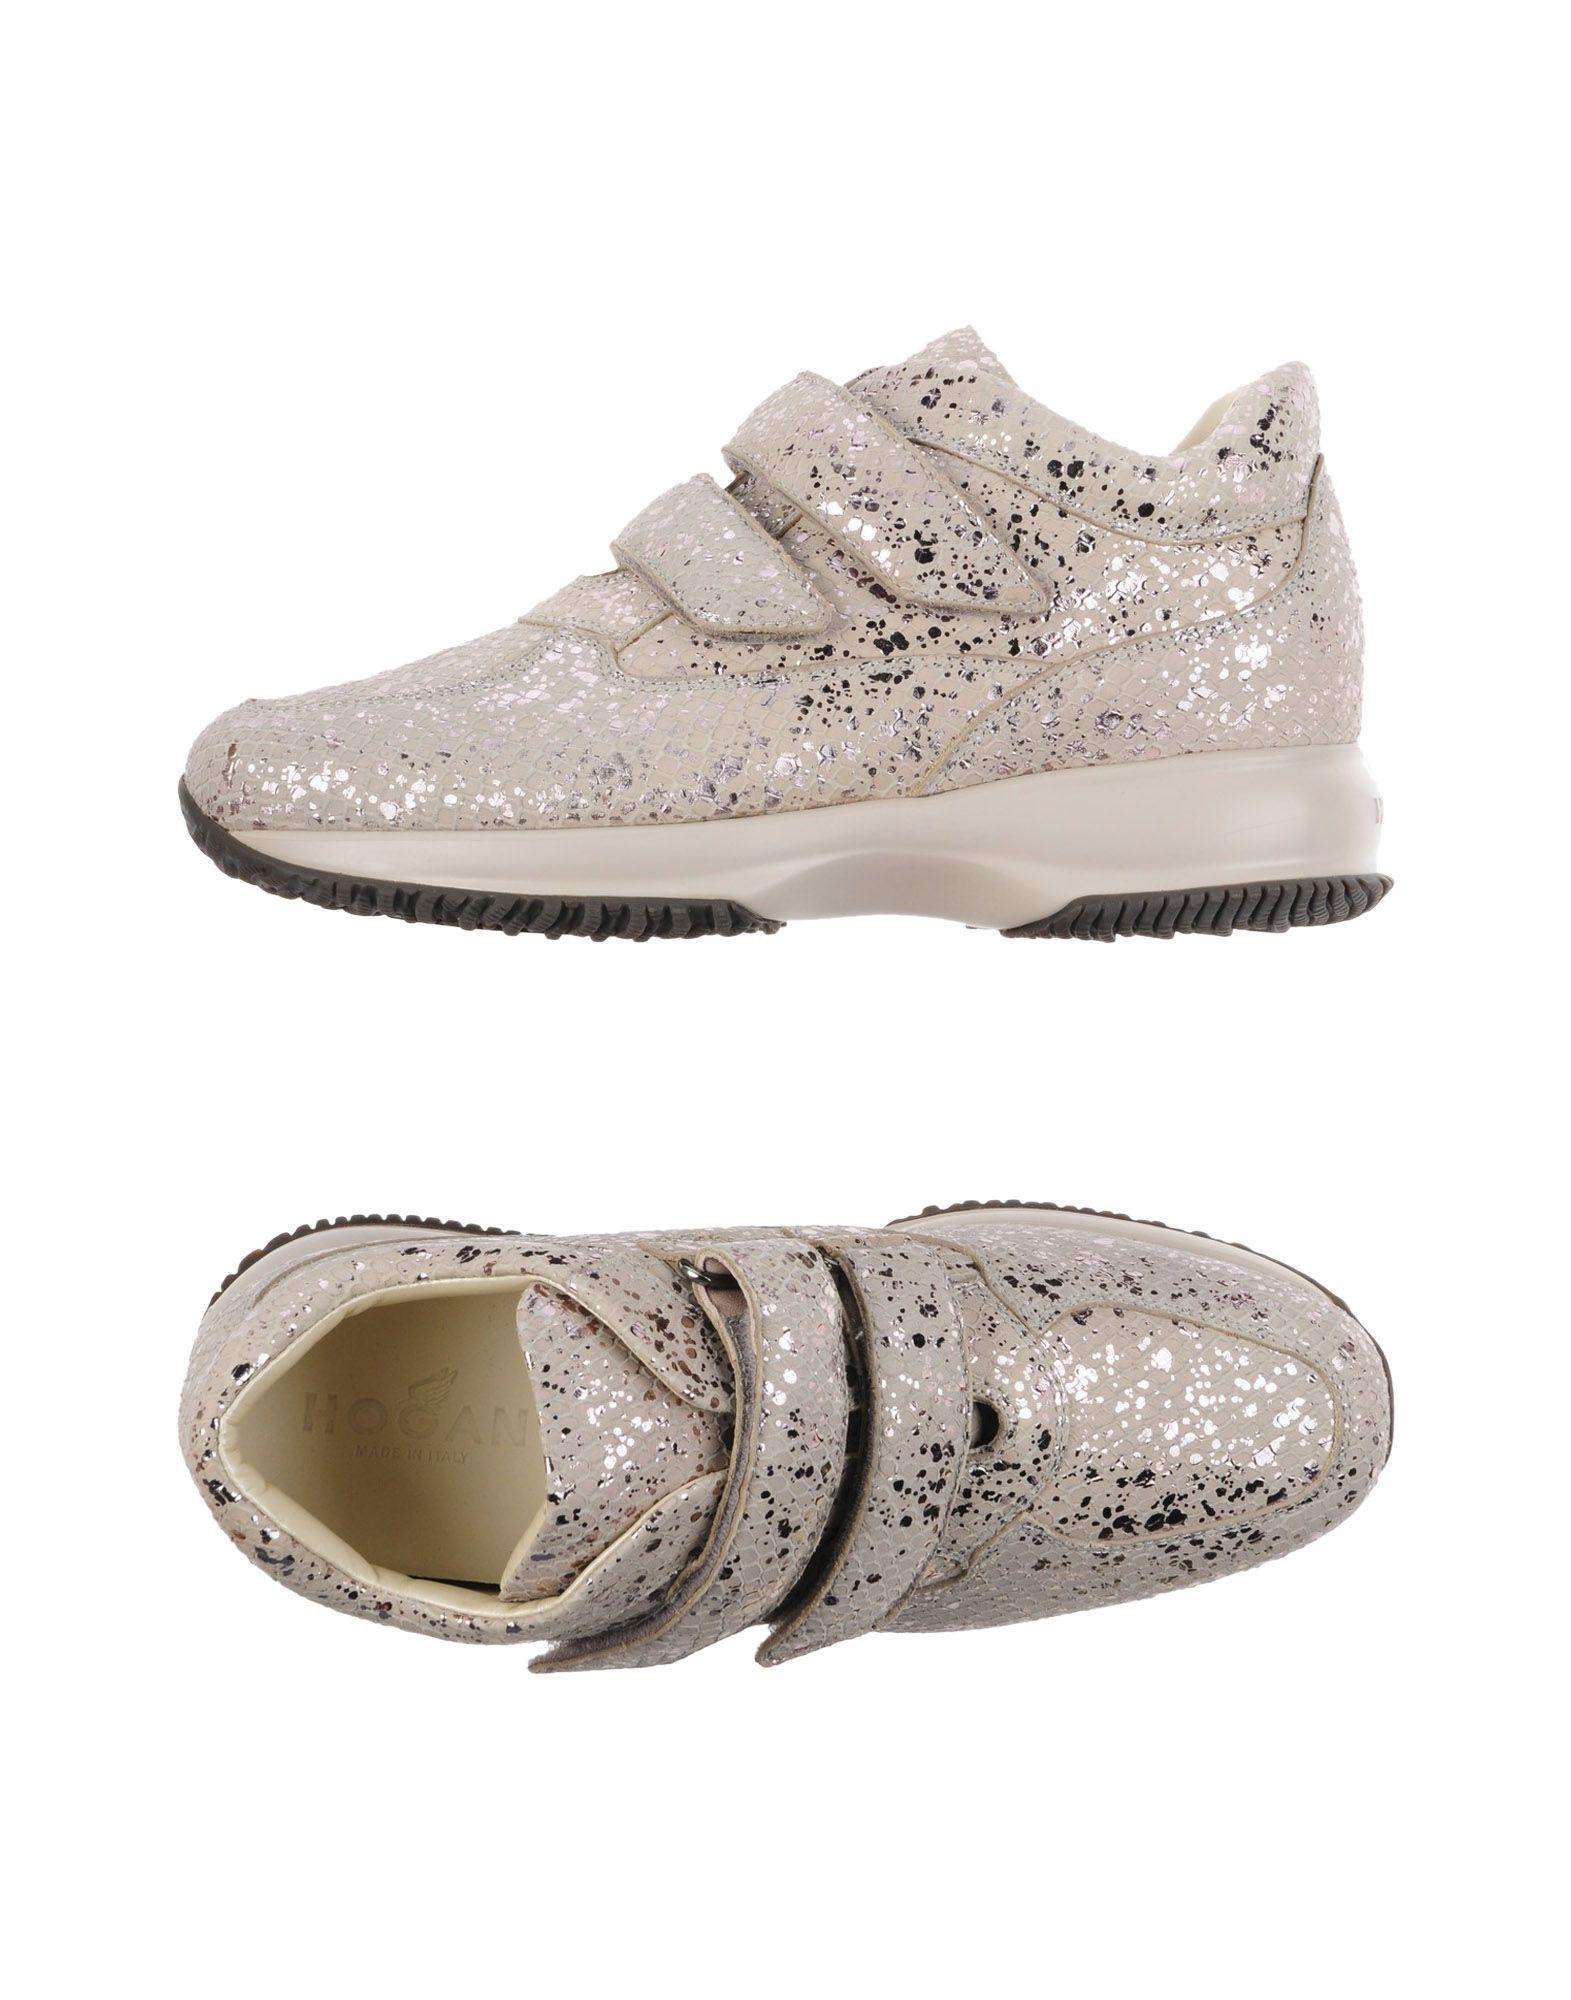 Rabatt Schuhe Sneakers Hogan Sneakers Schuhe Damen  11299152LF de59a9